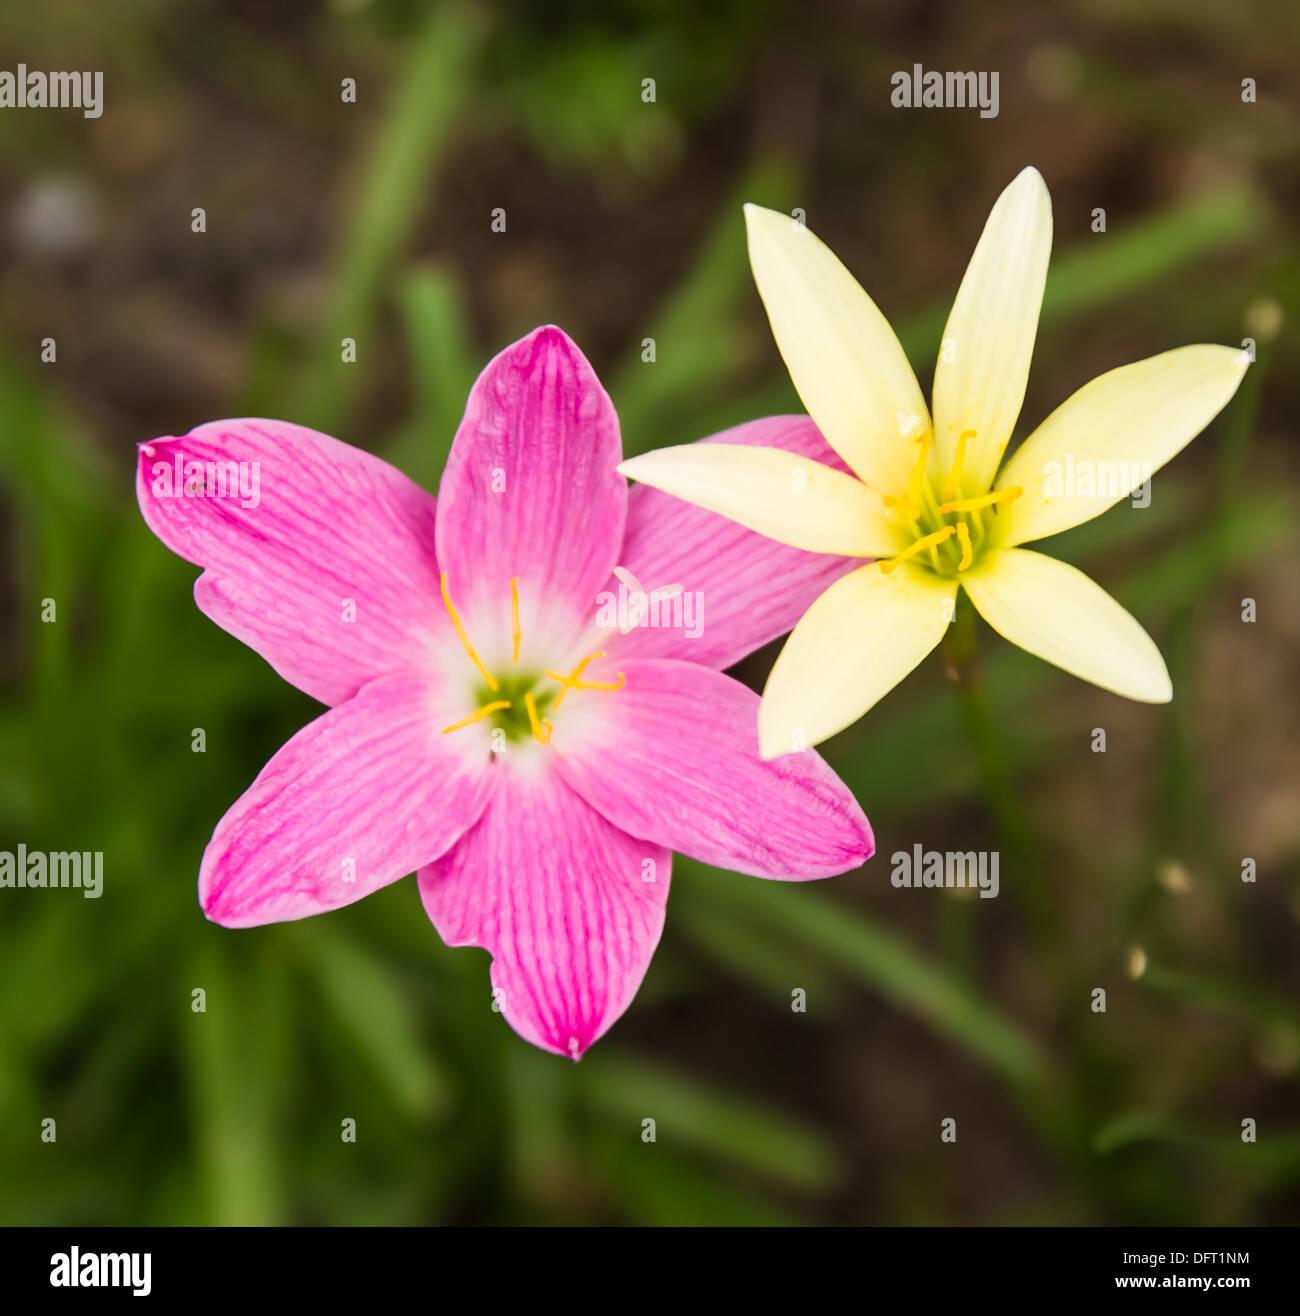 Pink canna lily flowers stock photos pink canna lily flowers stock pink and yellow rain lily zephyranthes stock image izmirmasajfo